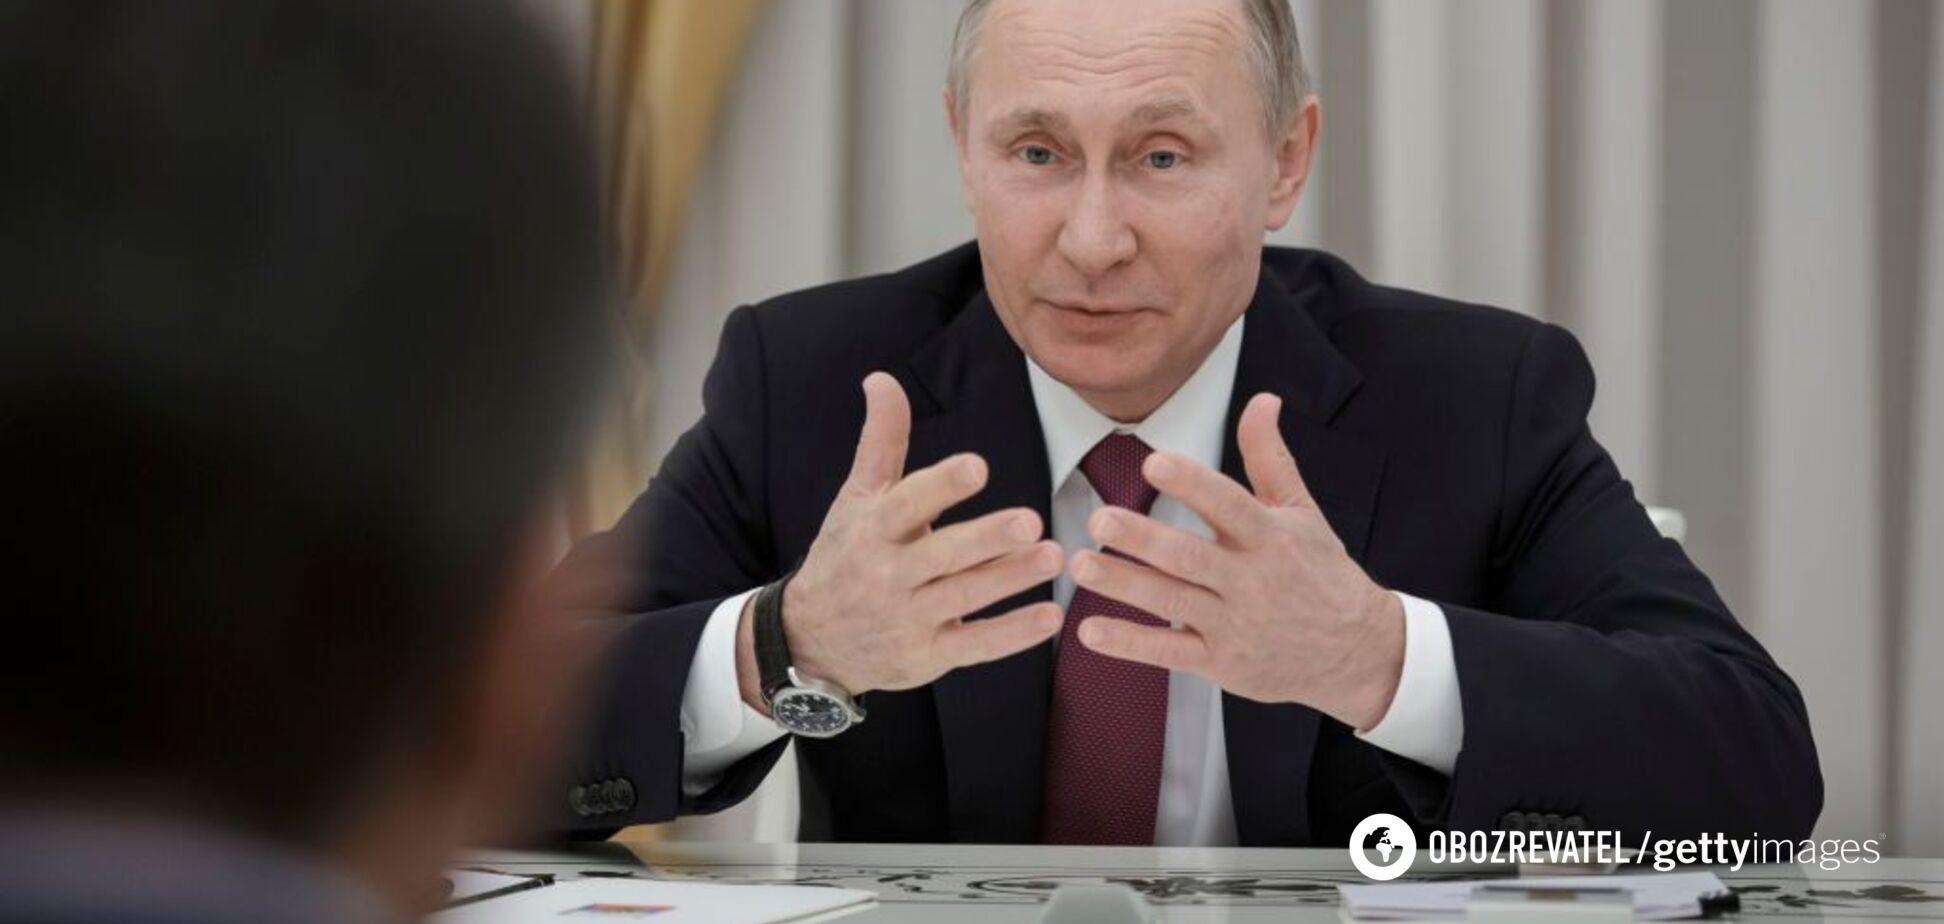 Він дуже поспішає: названа вирішальна дата для Путіна